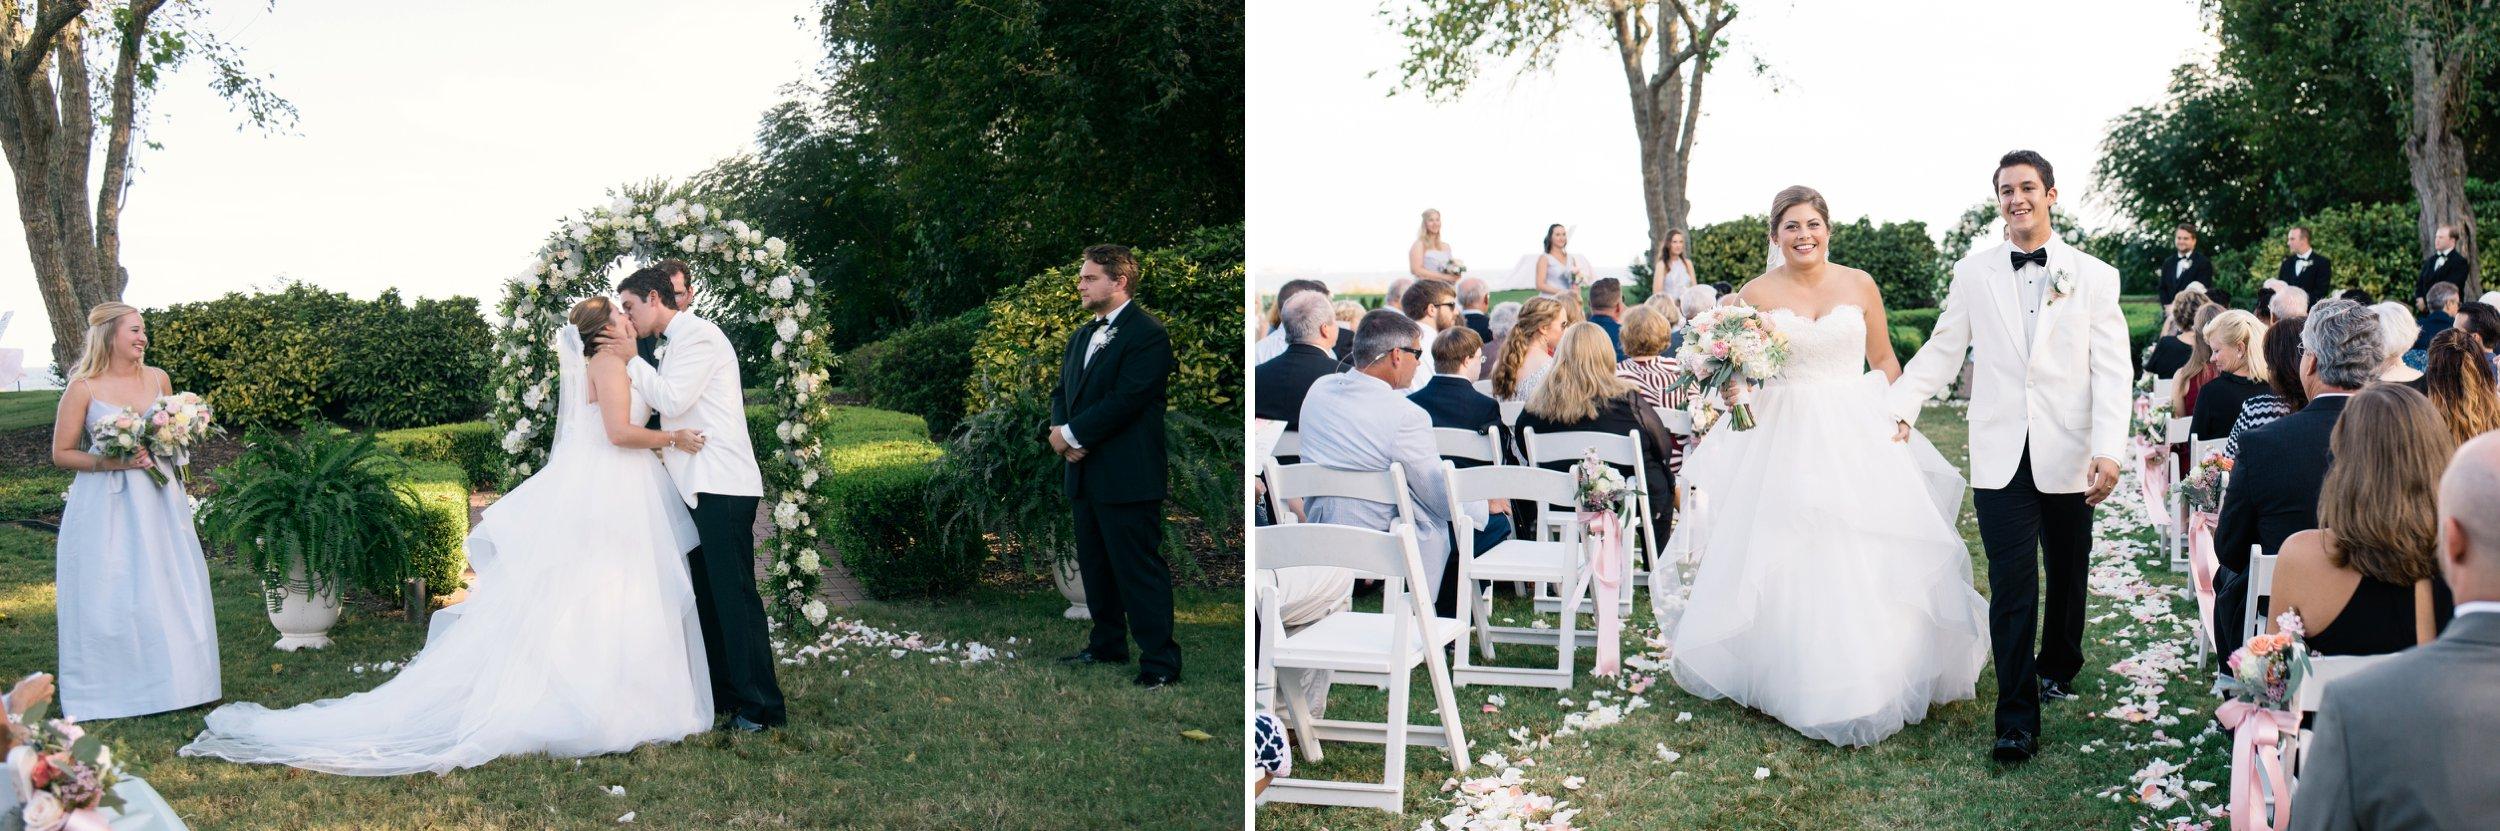 Charleston-wedding-photographer_0059.jpg